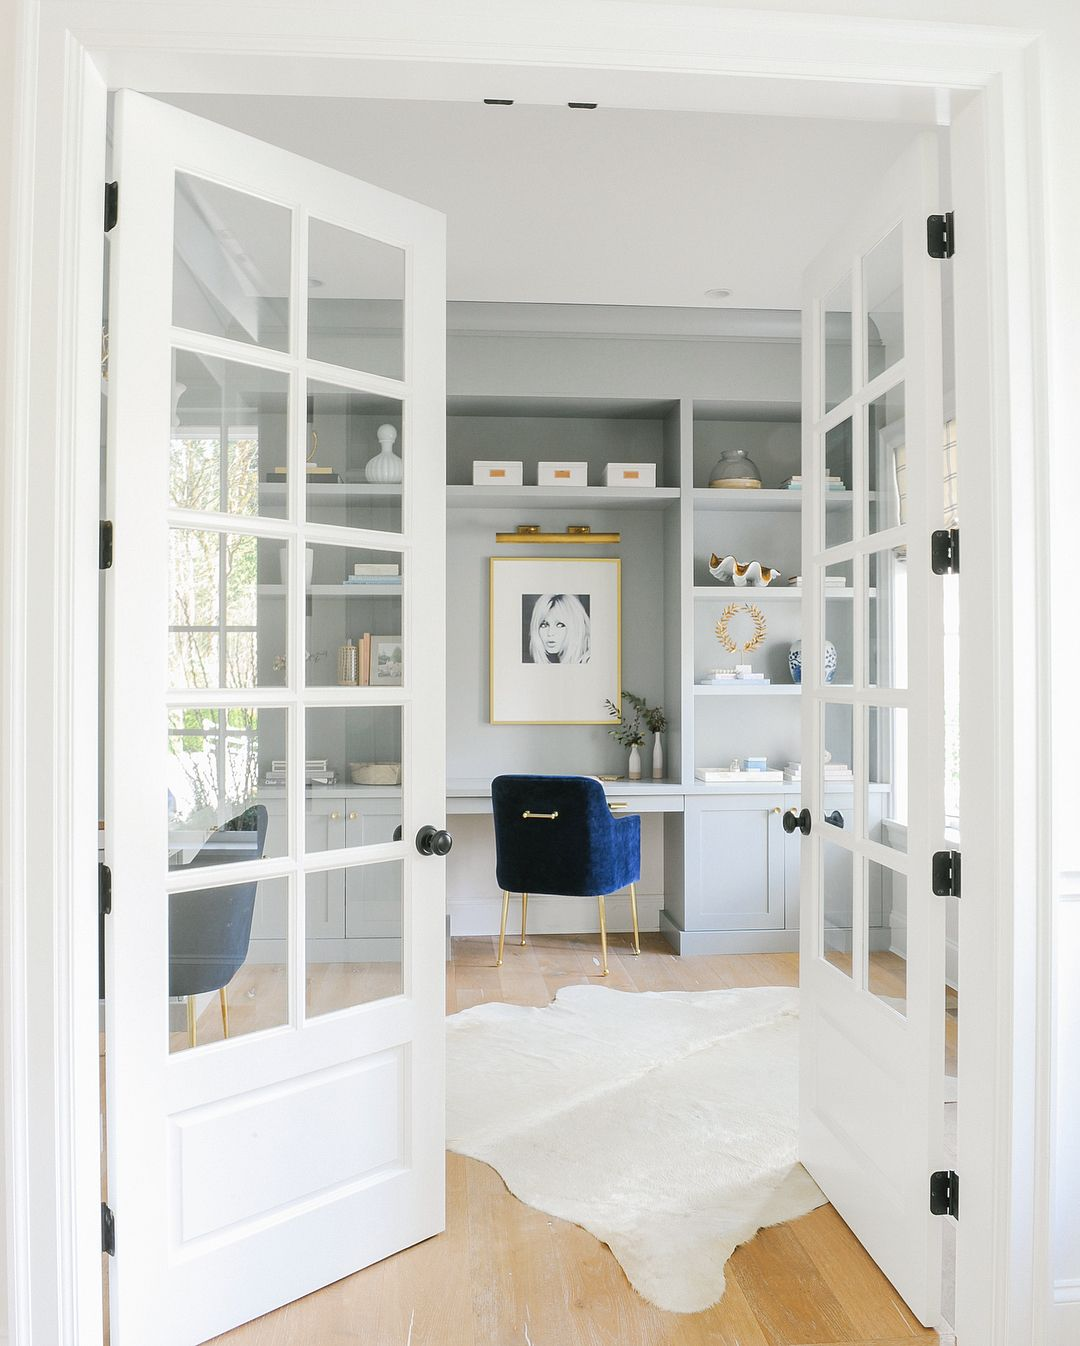 BM Coventry Gray Cabinets. Monika Hibbs On Instagram